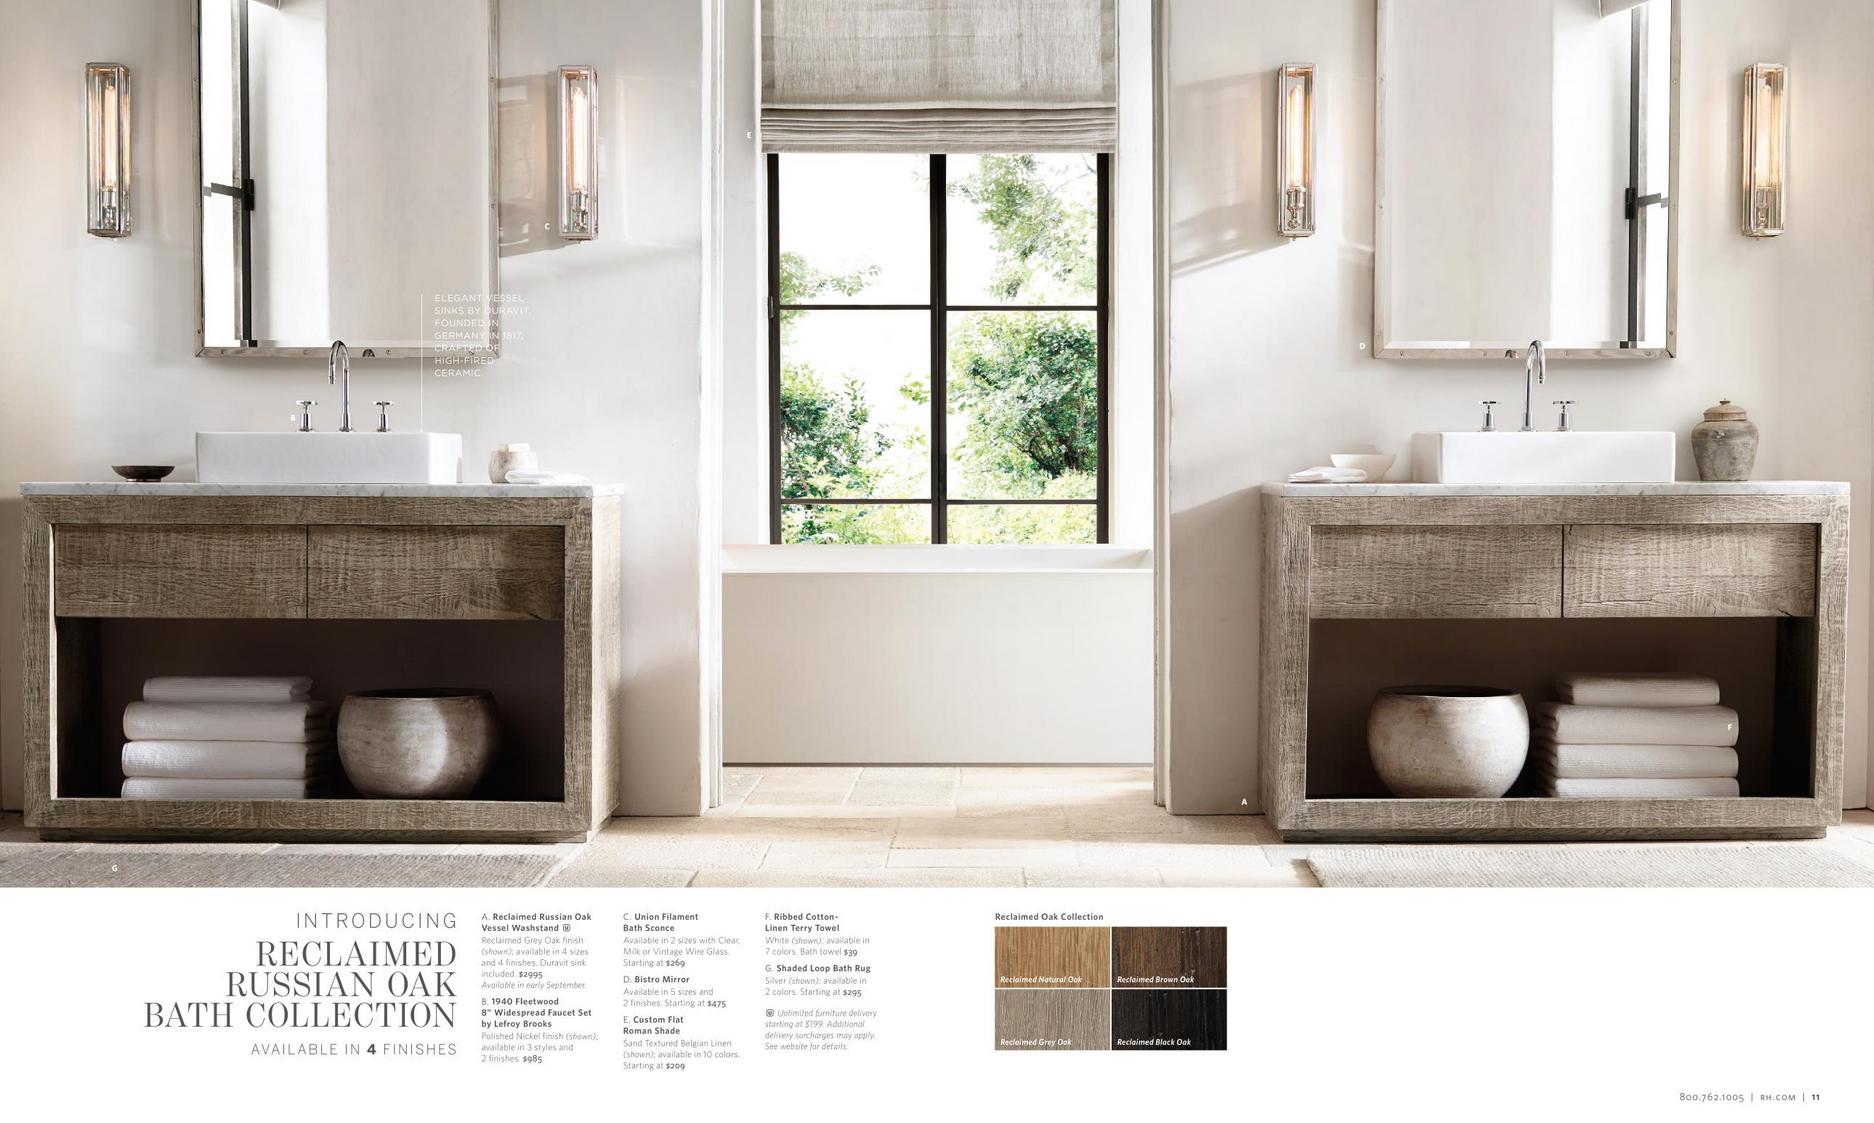 Reclaimed Russian Oak Bath Collection | Dream Home | Pinterest ...